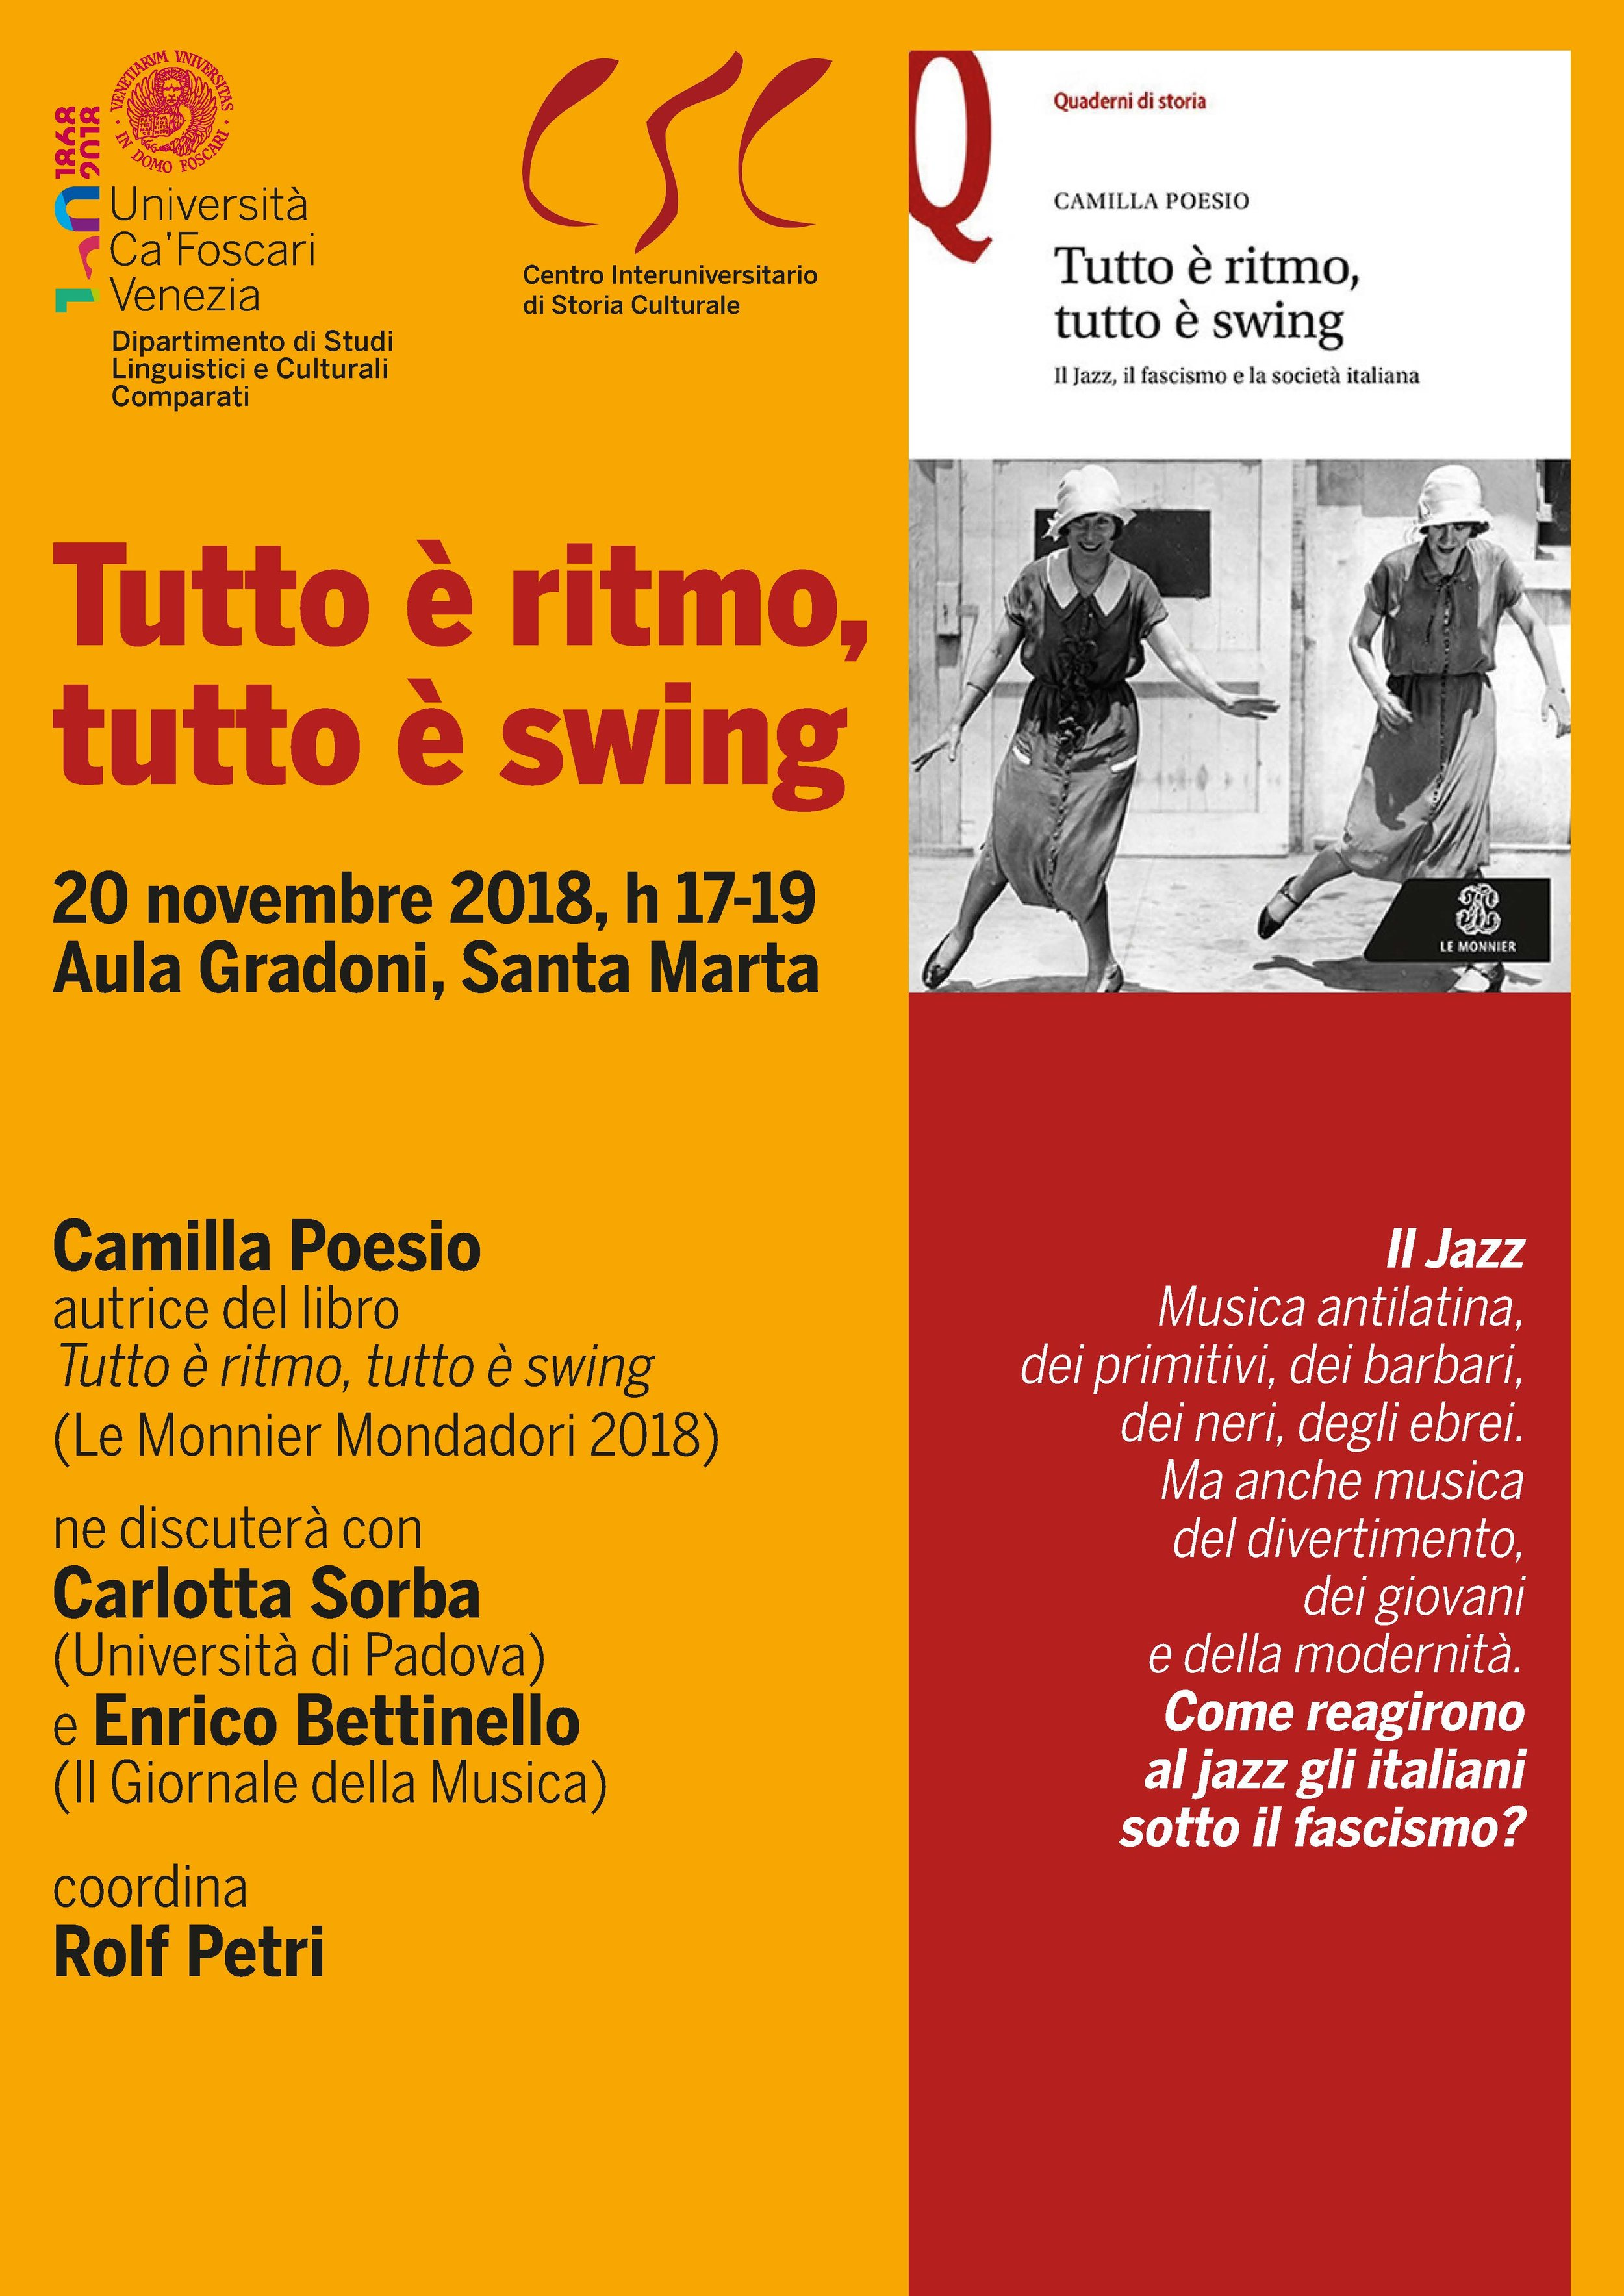 locandina jazz e fascismo 20 nov 2018 venezia_DEF_DEF.jpg